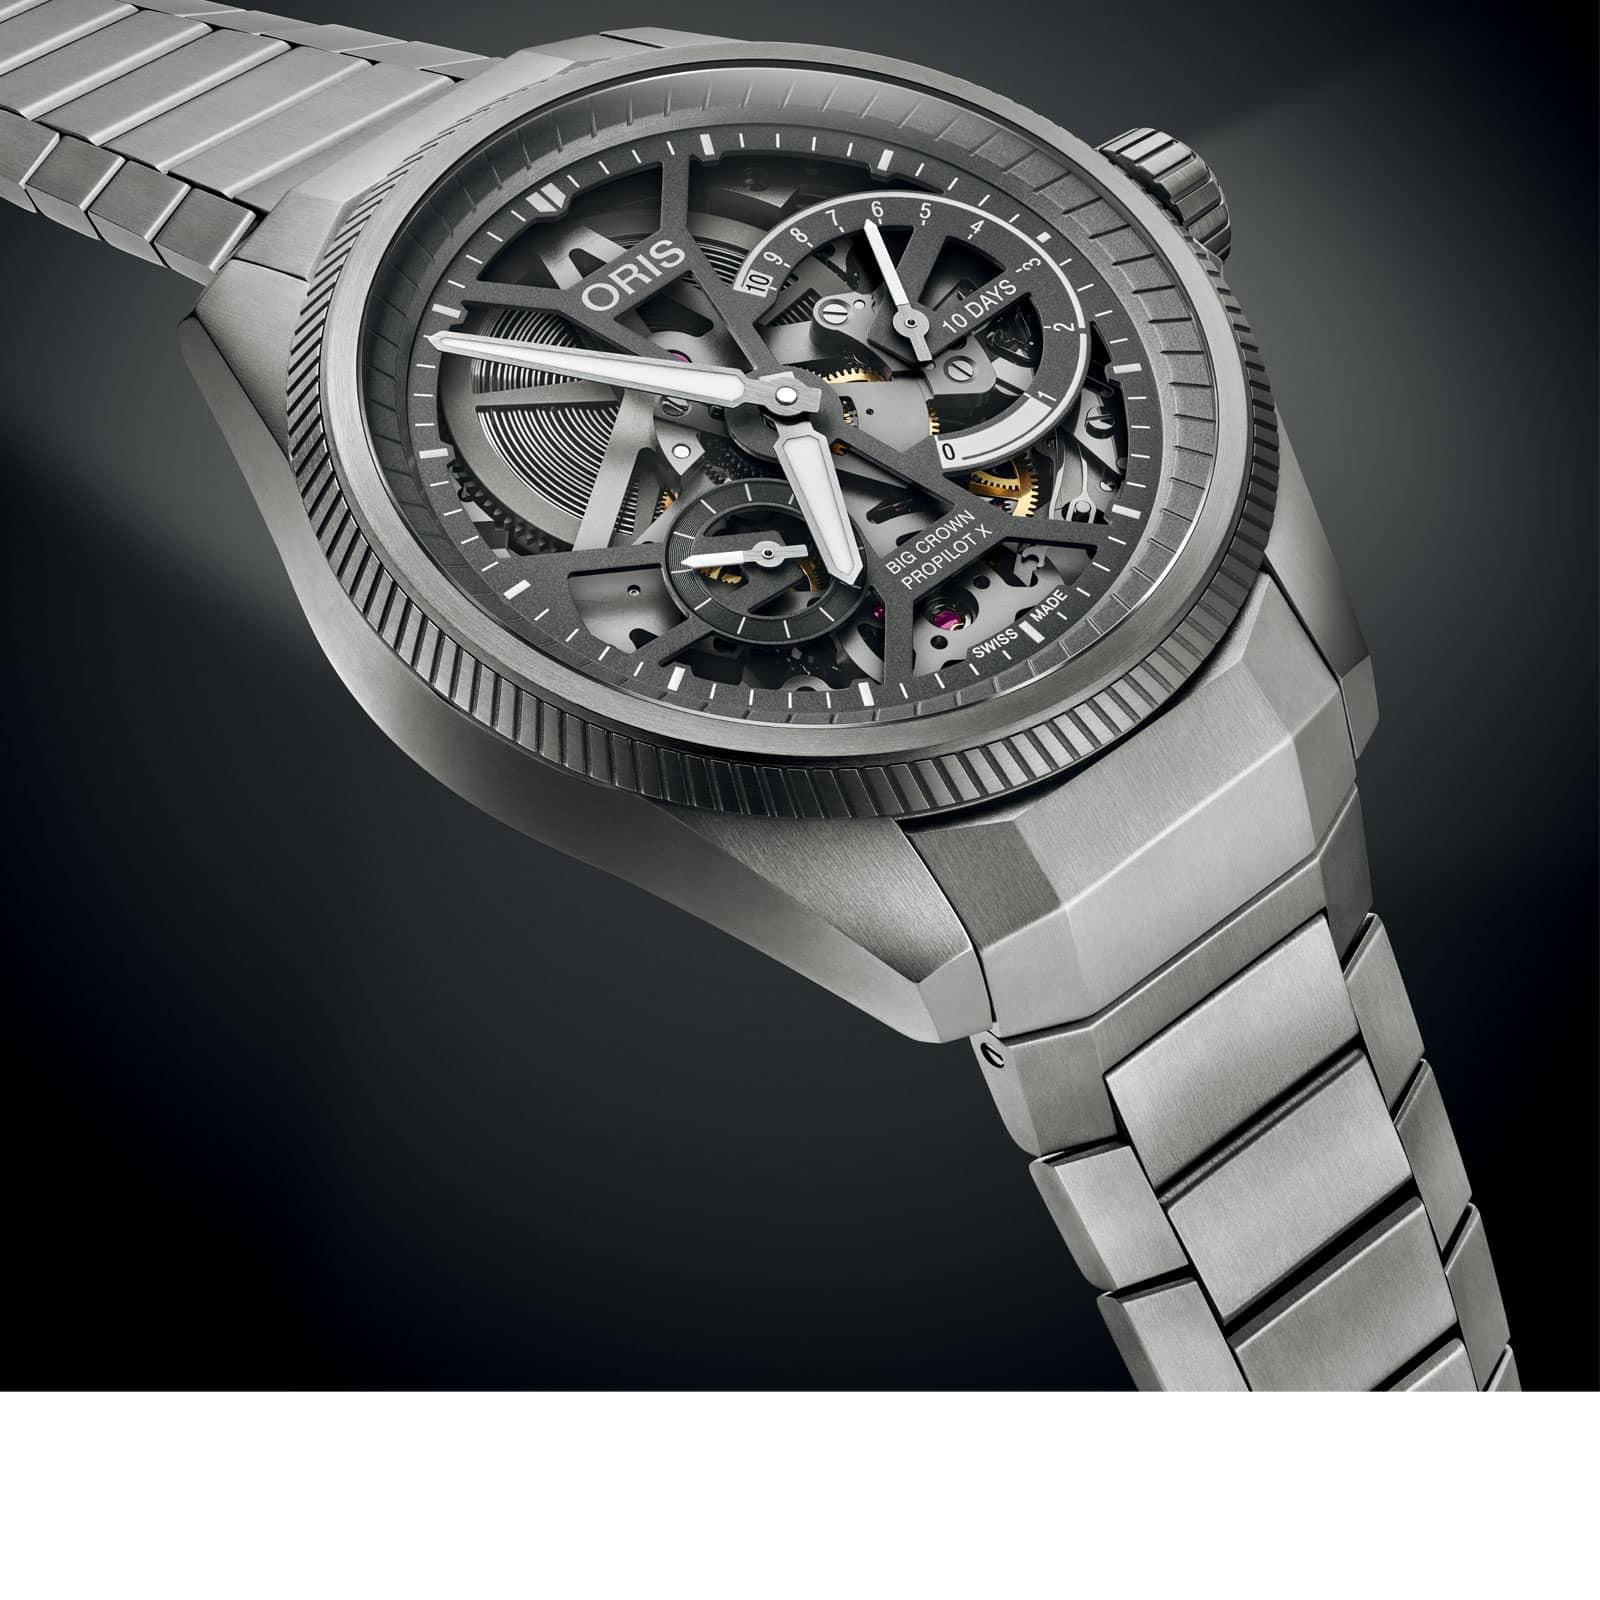 Montre-oris-Lionel-Meylan-horlogerie-joaillerie-vevey.jpg